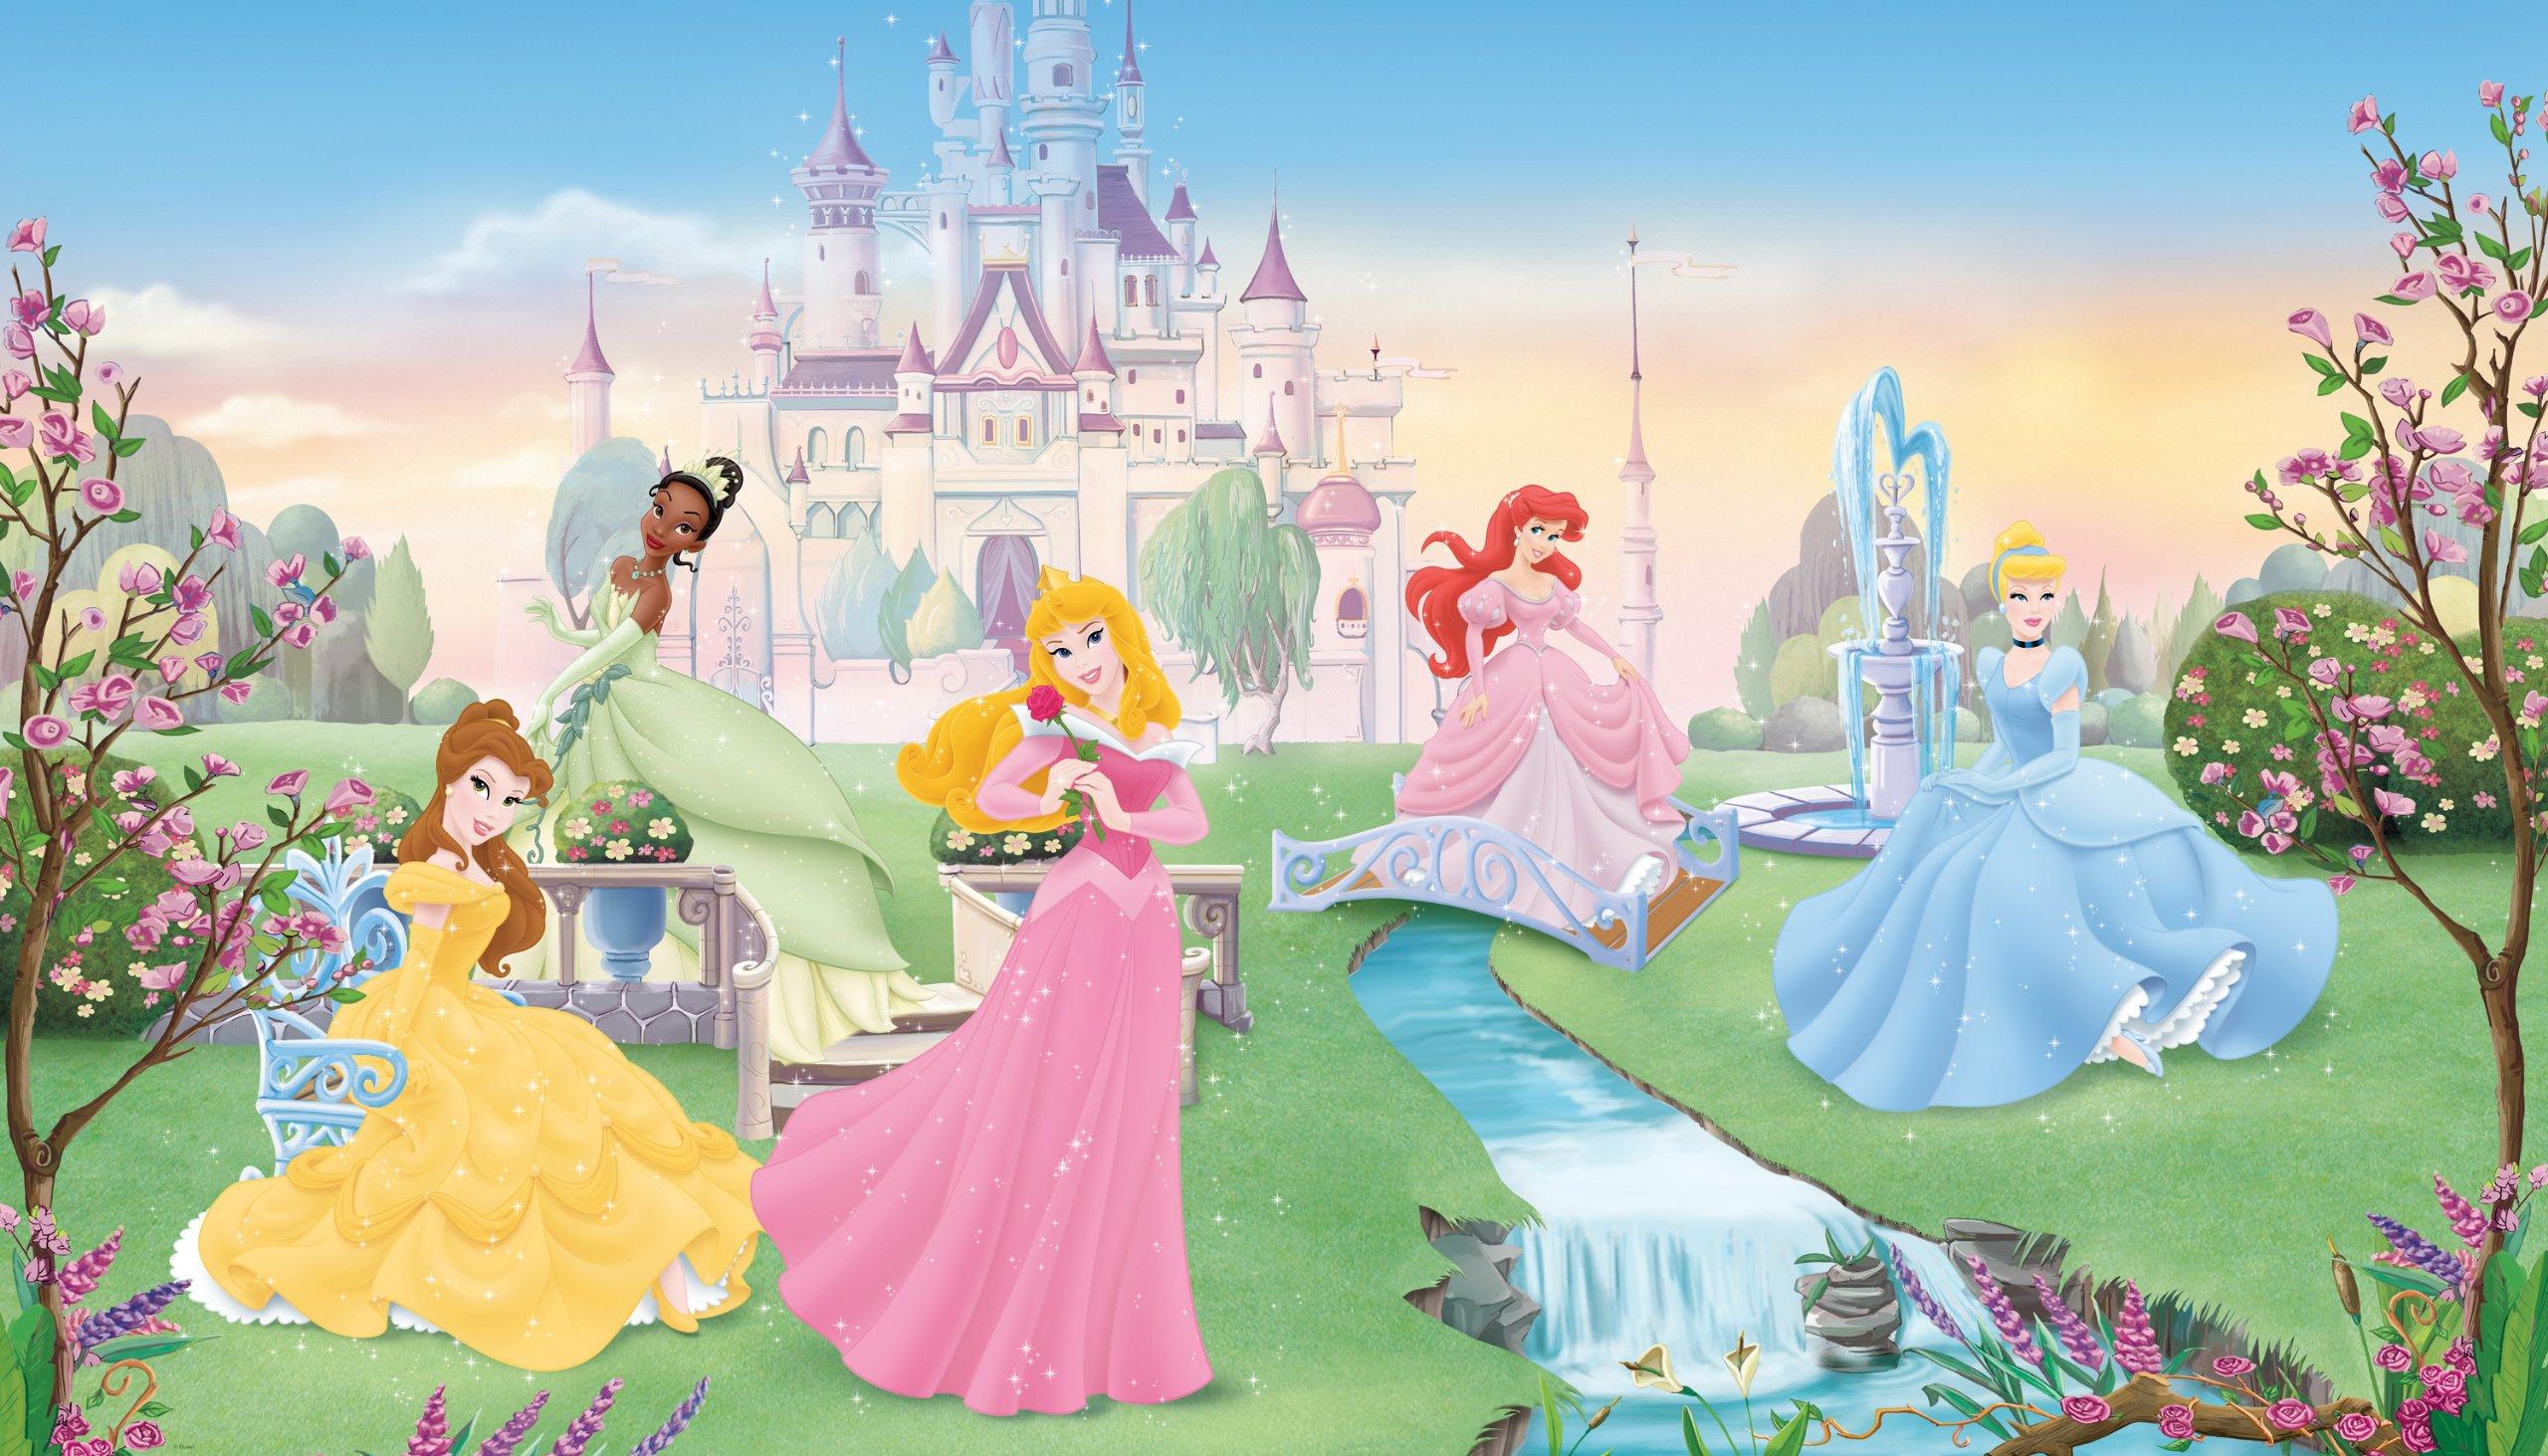 RoomMates JL1228M Disney Dancing Princess 6-Foot-by-10.5-Foot Prepasted Wall Mural